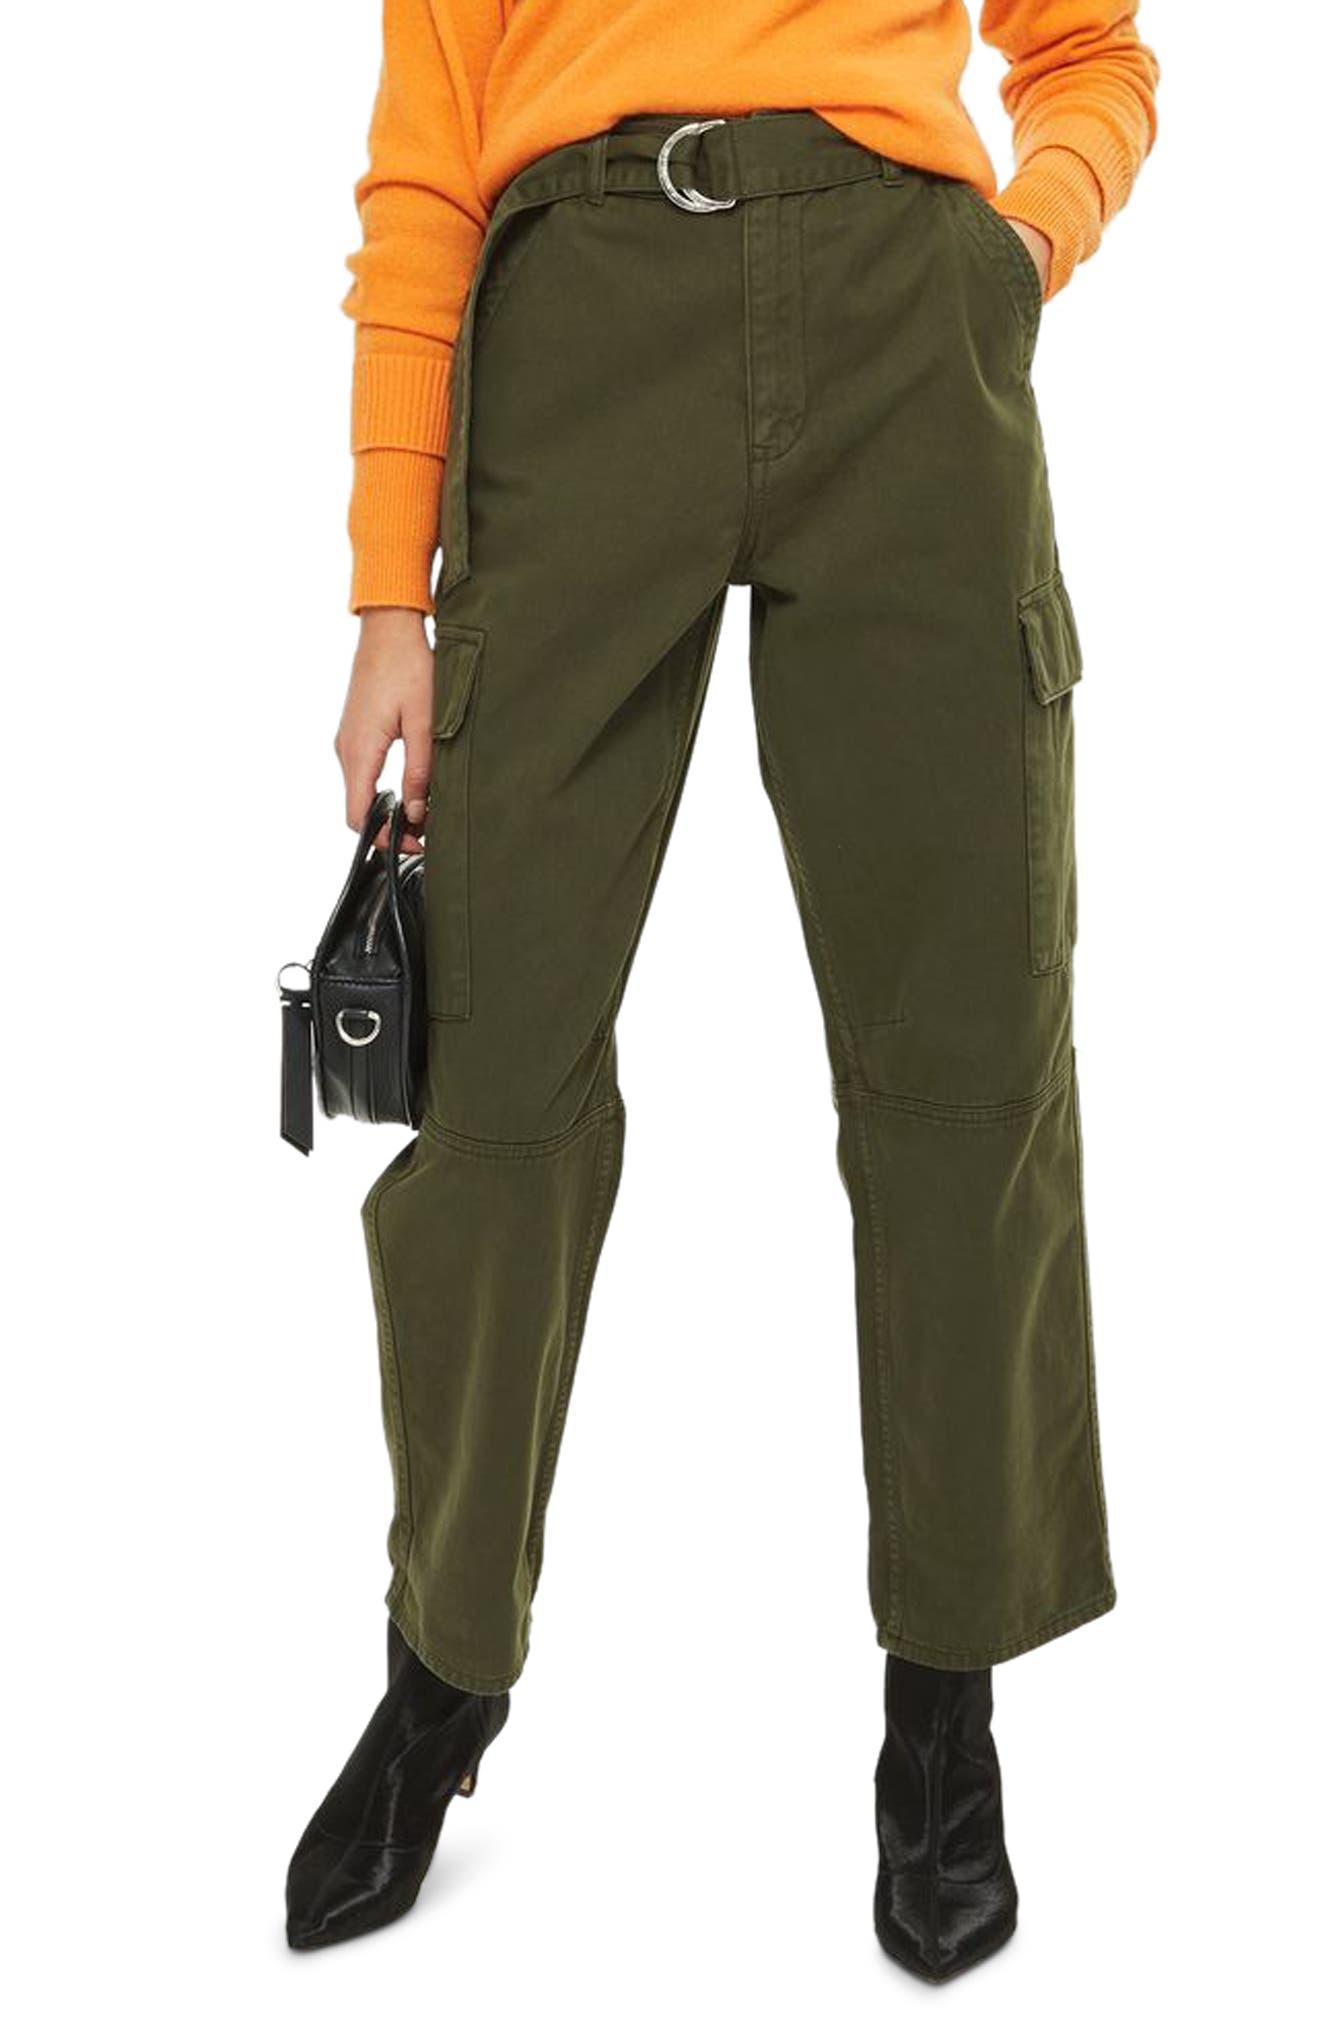 Combat Pocket Utility Trousers,                             Main thumbnail 1, color,                             310